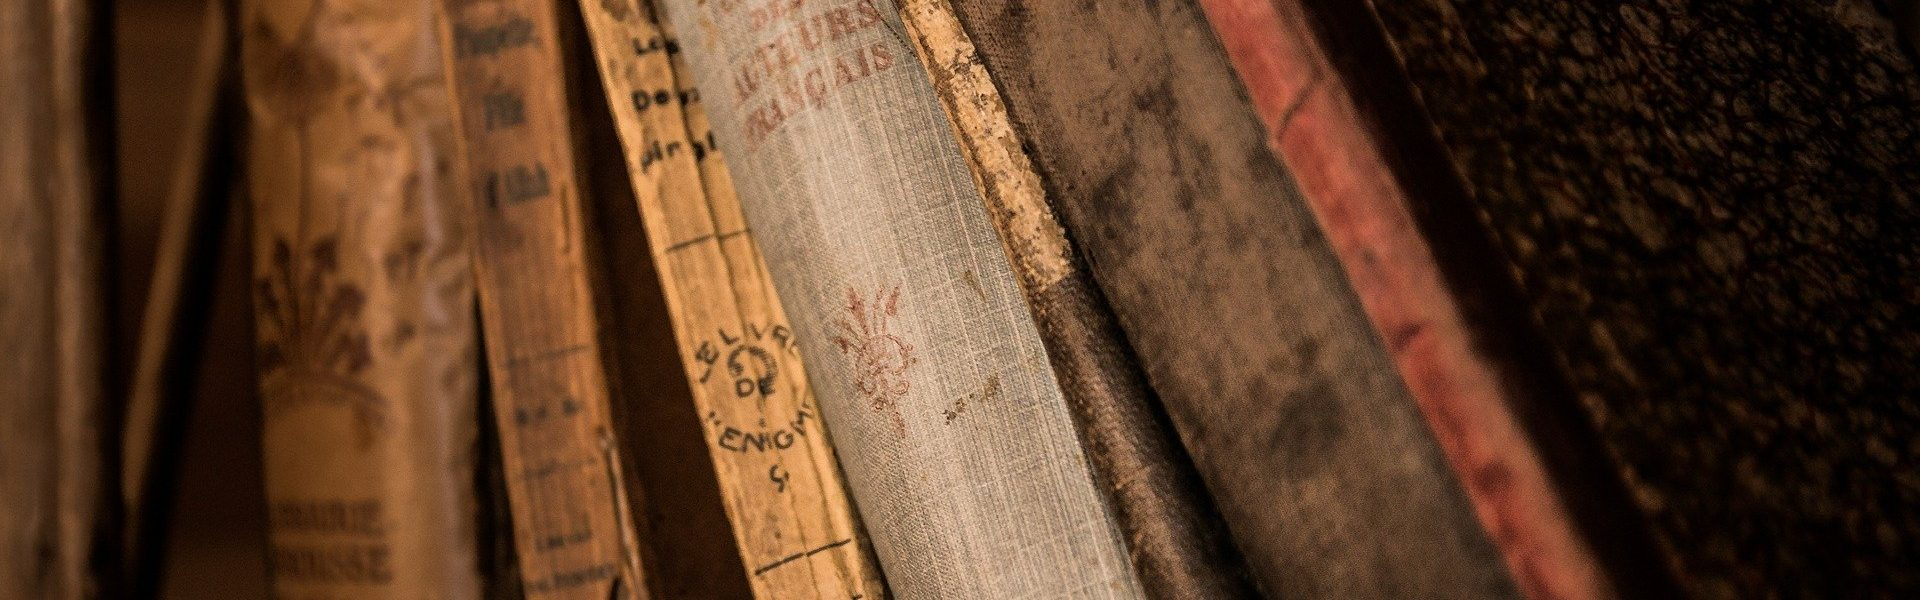 old-books-436498_1920x900